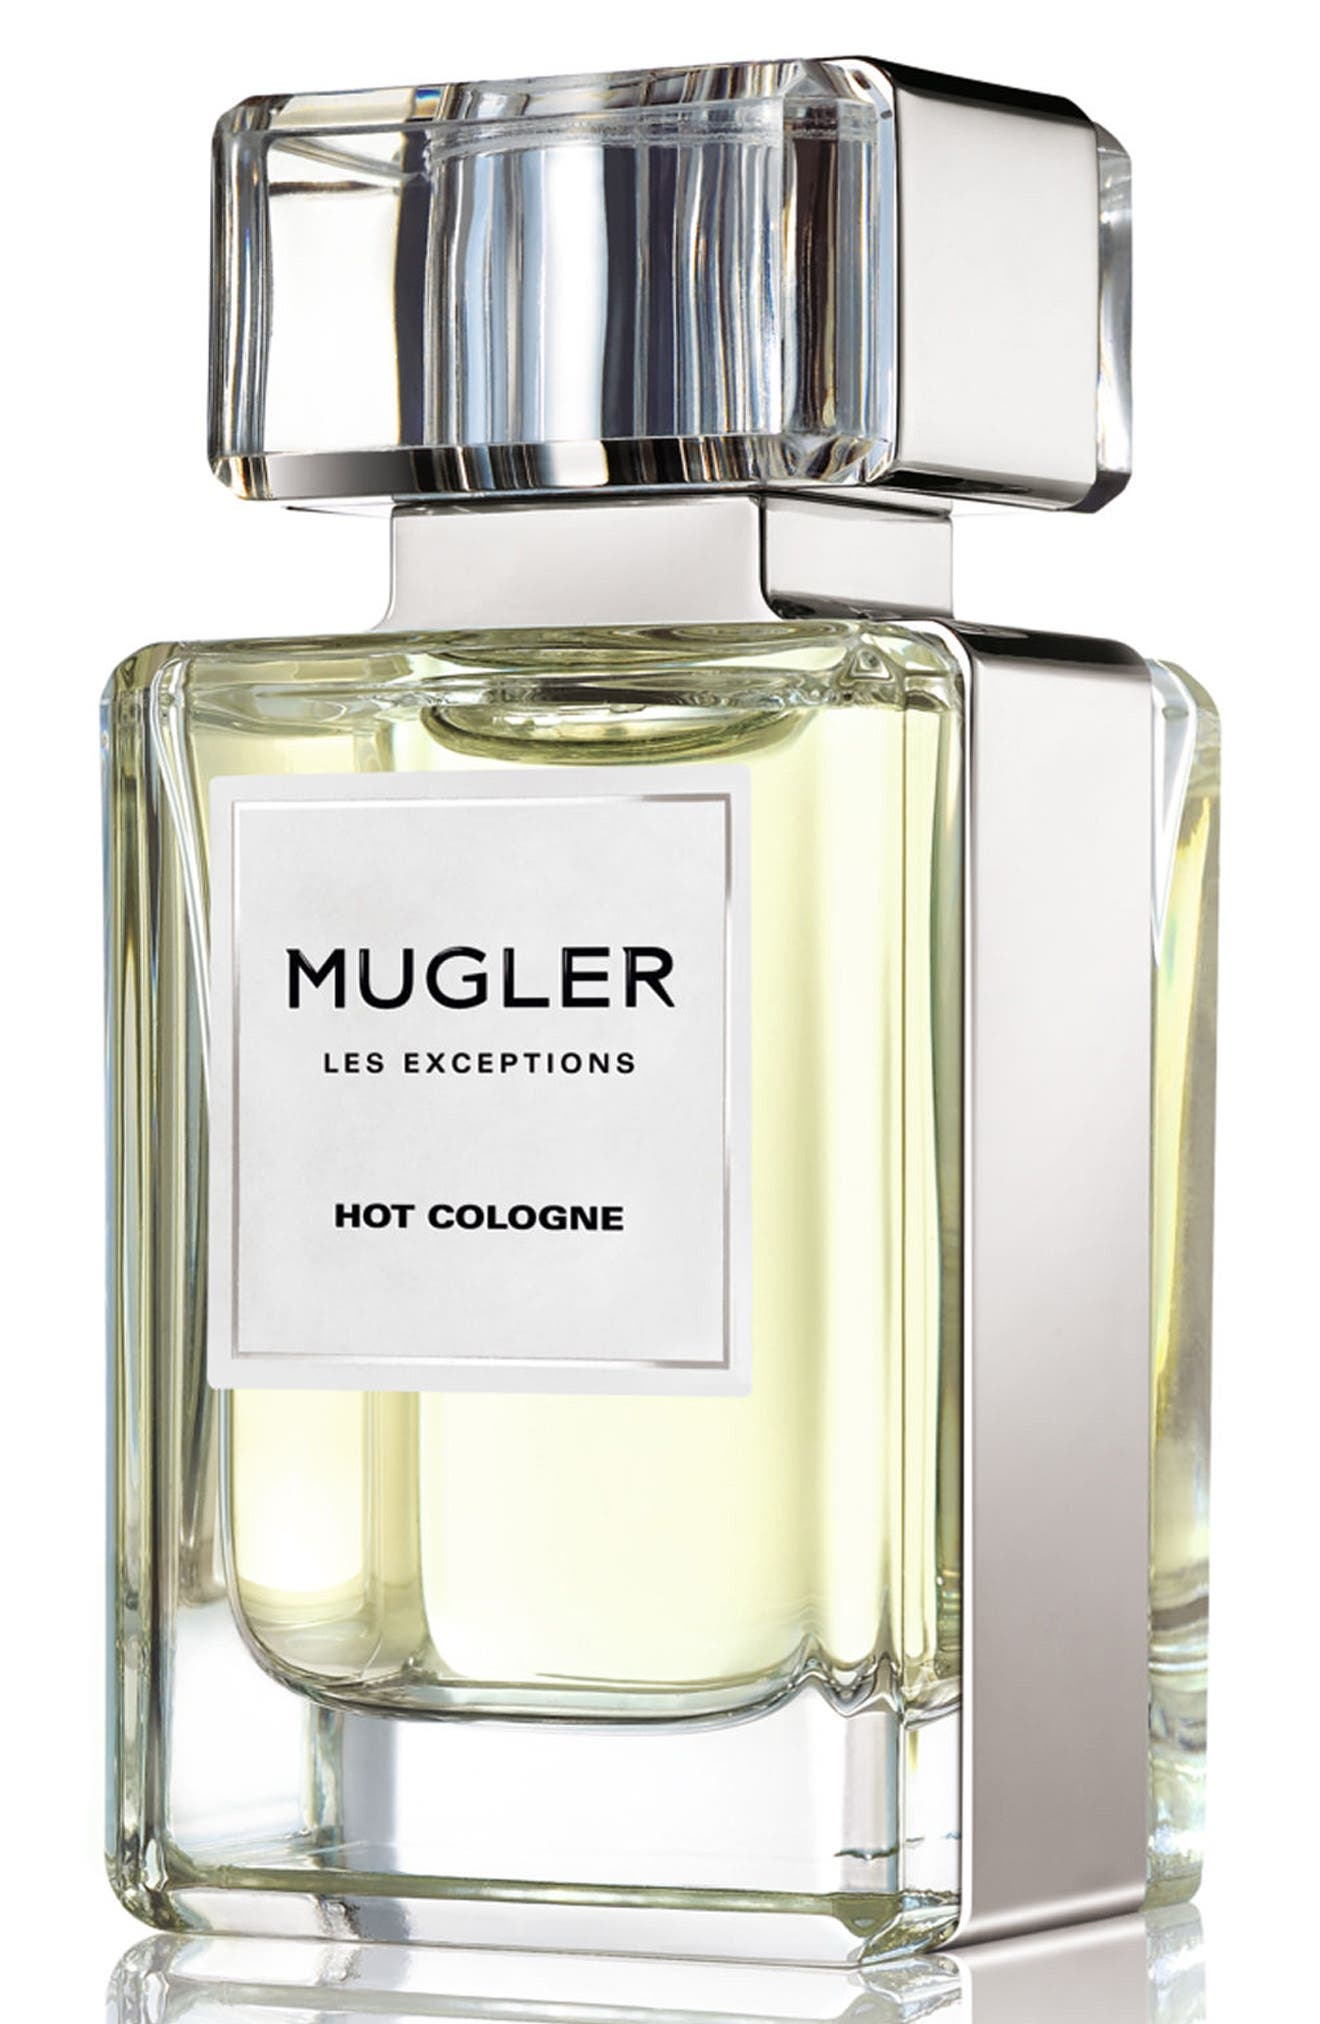 MUGLER,                             Les Exceptions by Mugler Hot Cologne Eau de Parfum Refillable Spray,                             Main thumbnail 1, color,                             NO COLOR